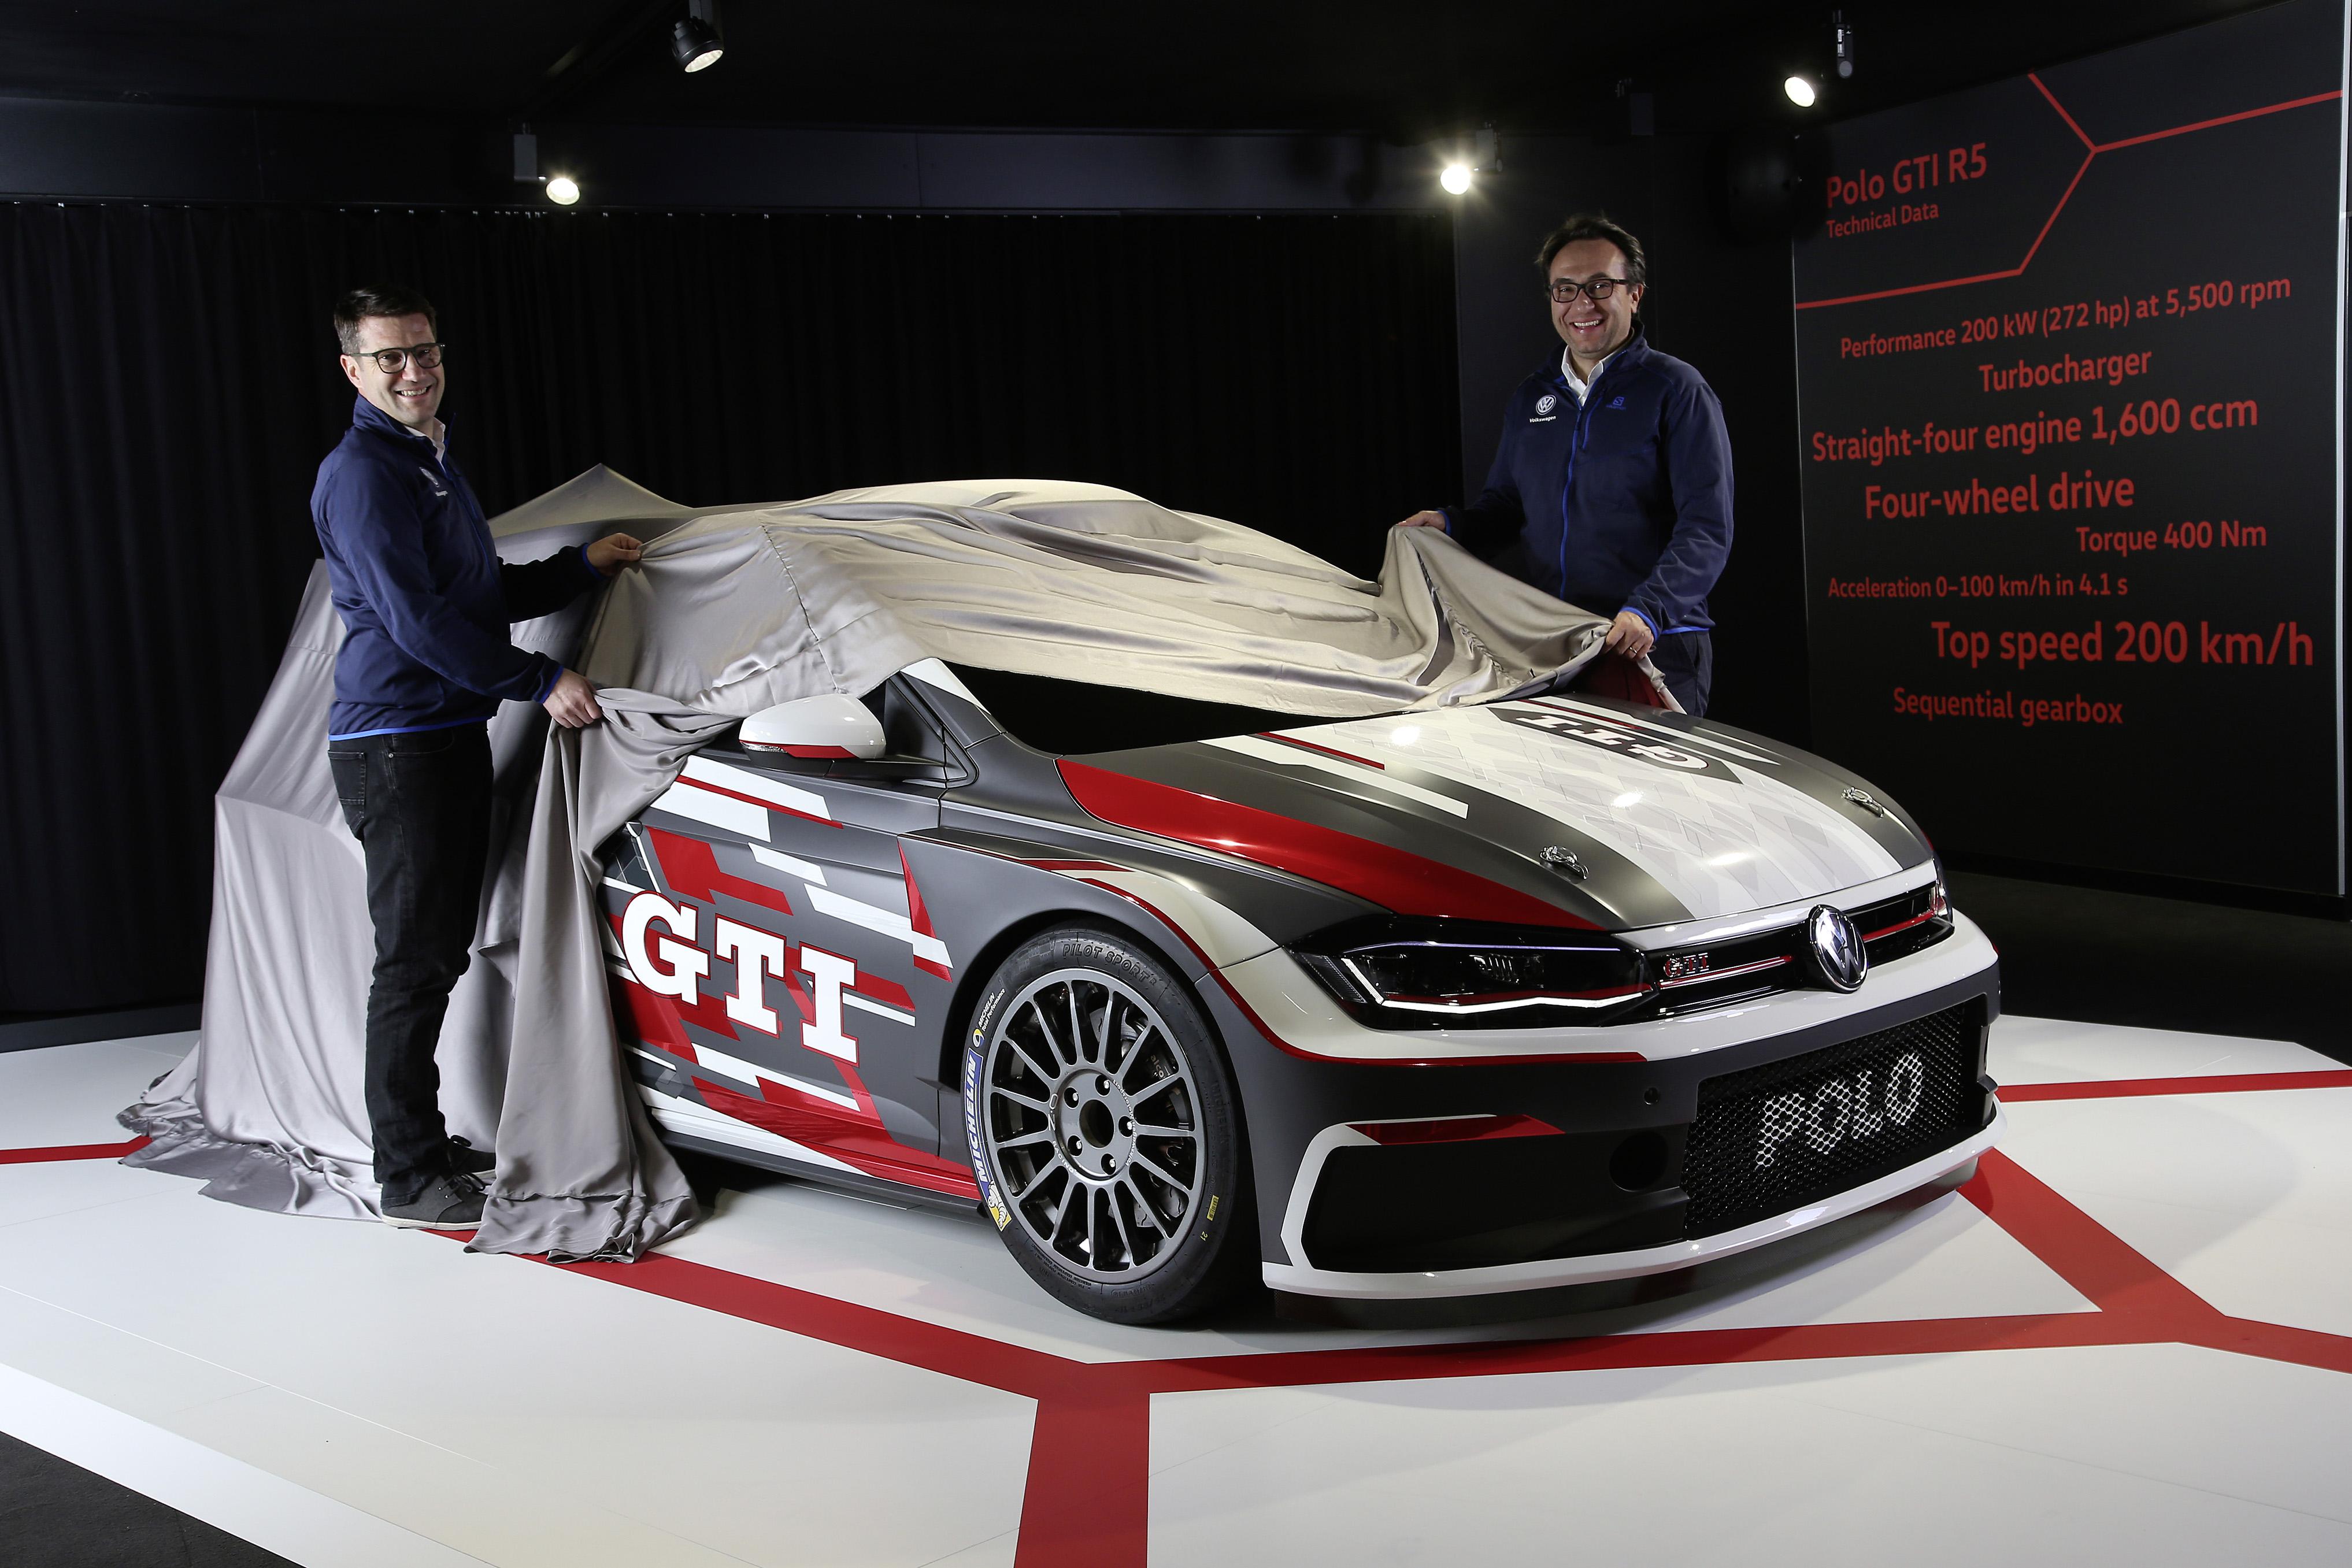 Volkswagen Polo Gti R5 Customer Race Car Unveiled Autoevolution